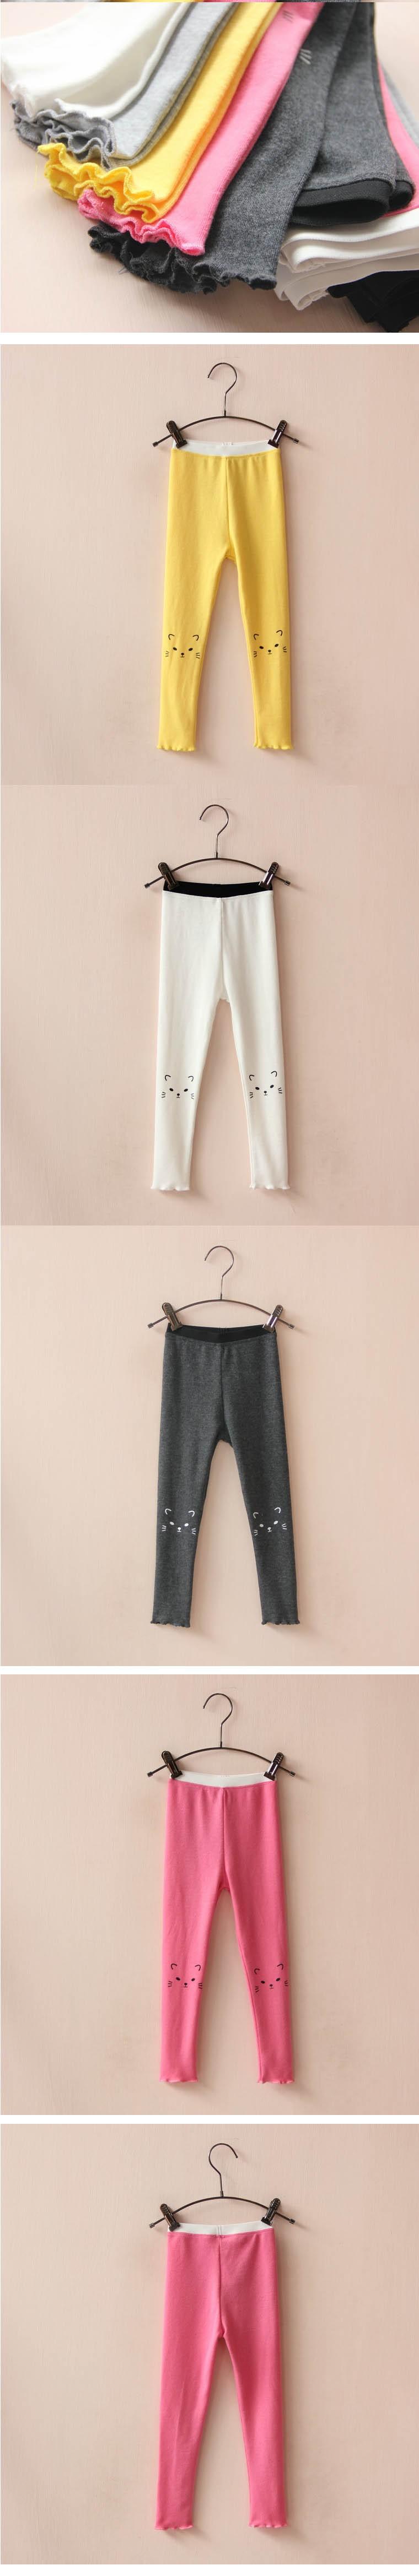 9a8f7b7108 ᐃ2016 de primavera nuevos bebés pantalones elásticos leggings ...